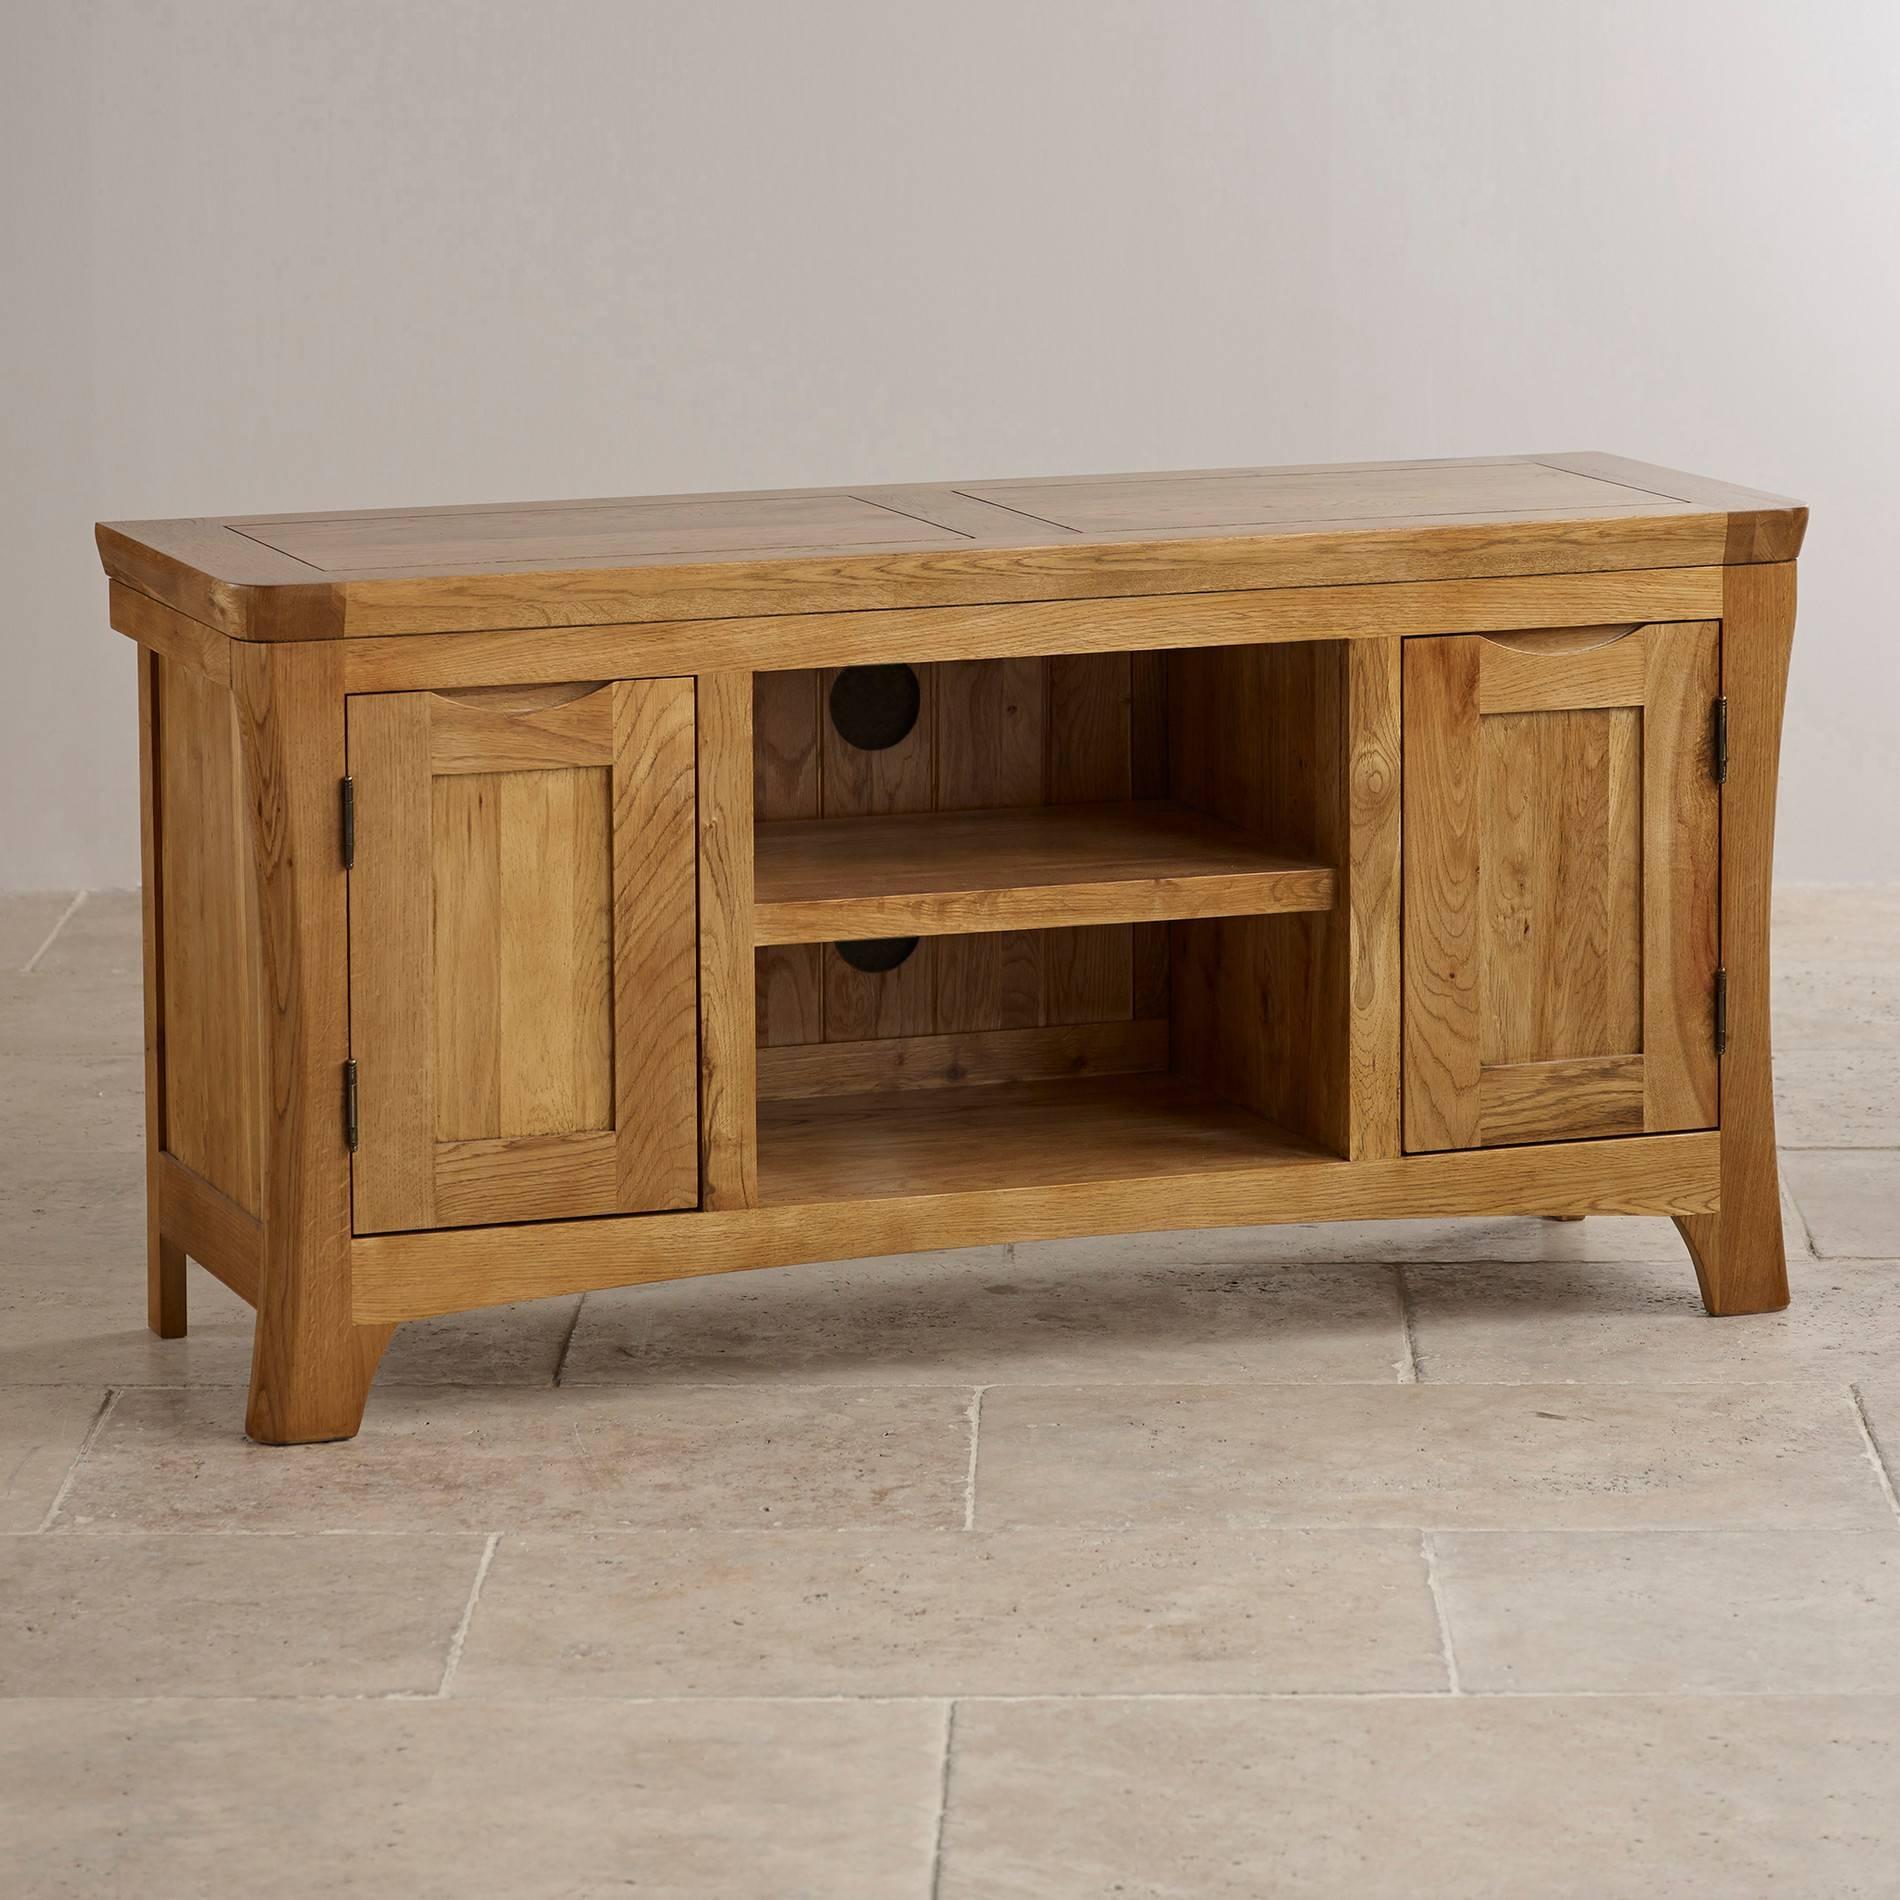 Orrick Wide Tv Cabinet In Rustic Solid Oak | Oak Furniture Land throughout Rustic Oak Tv Stands (Image 6 of 15)